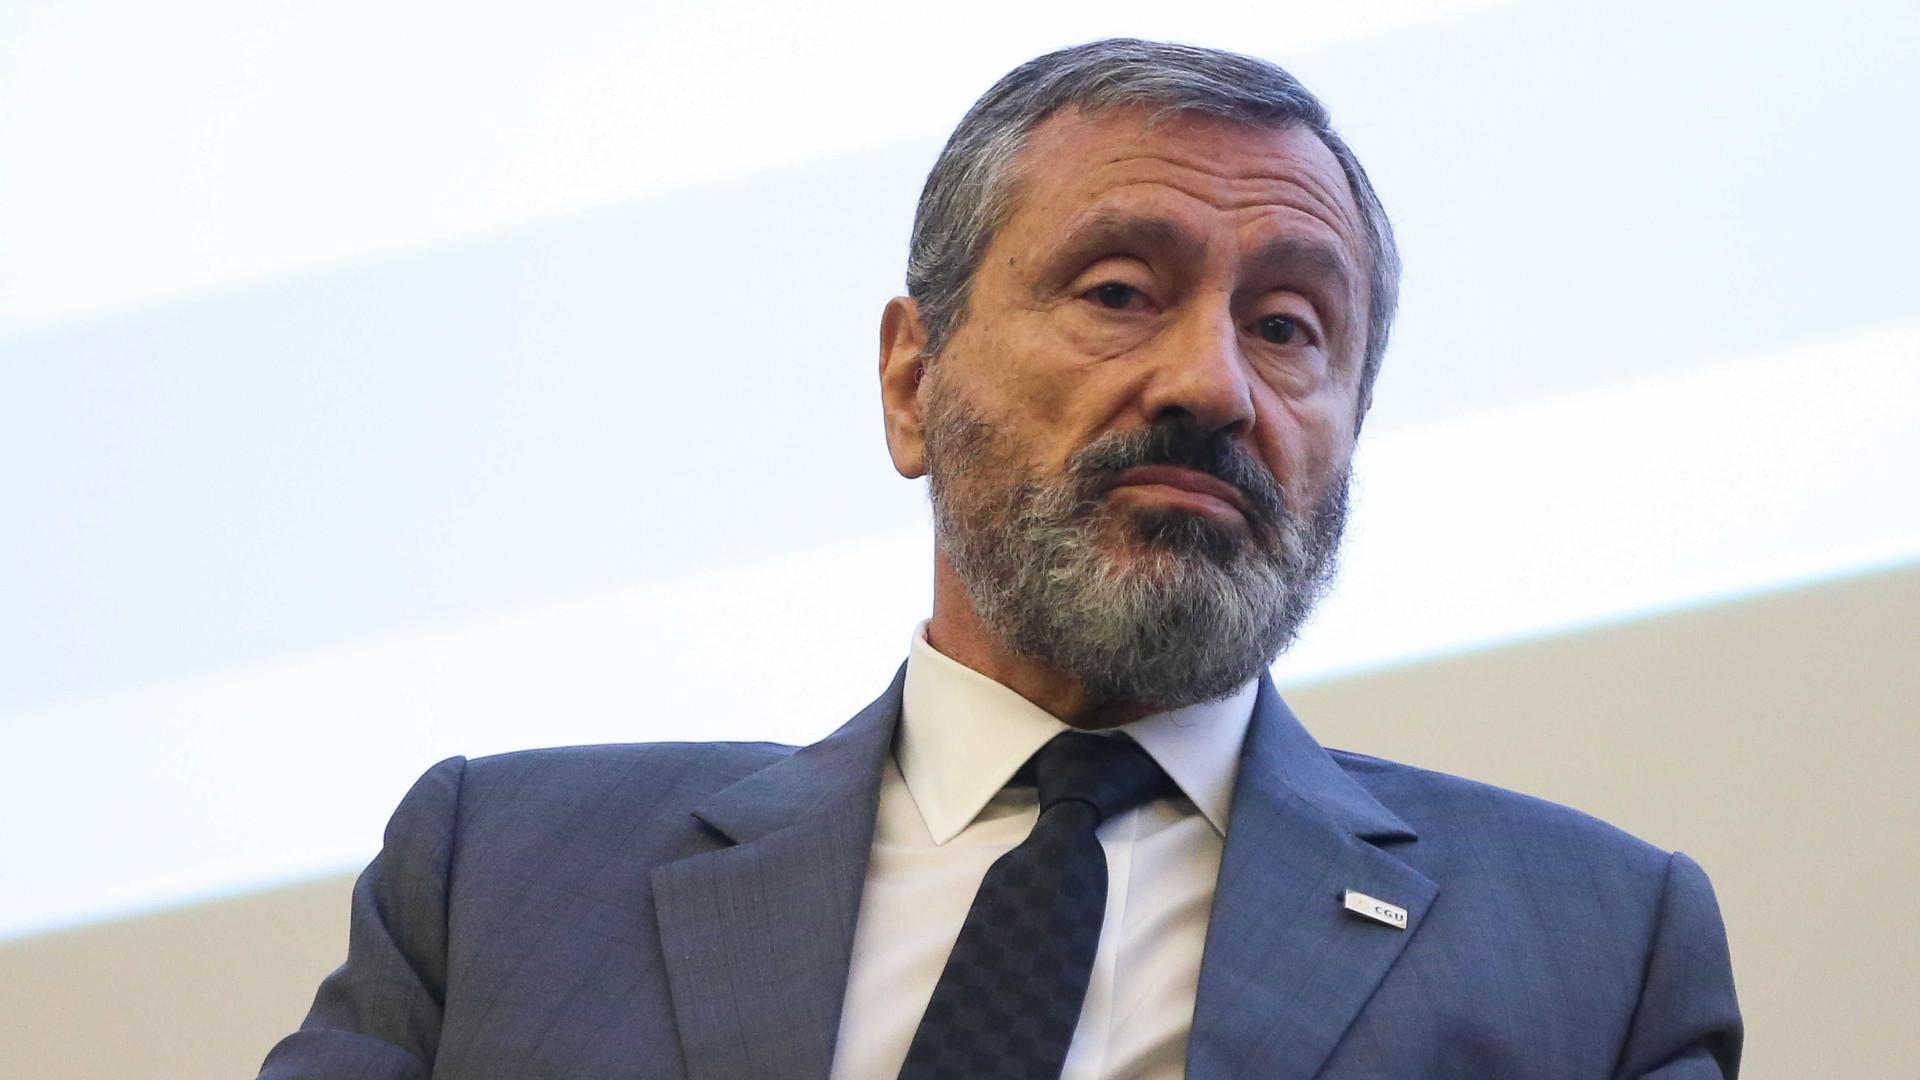 Ministro confirma que Temer quer extraditar Battisti